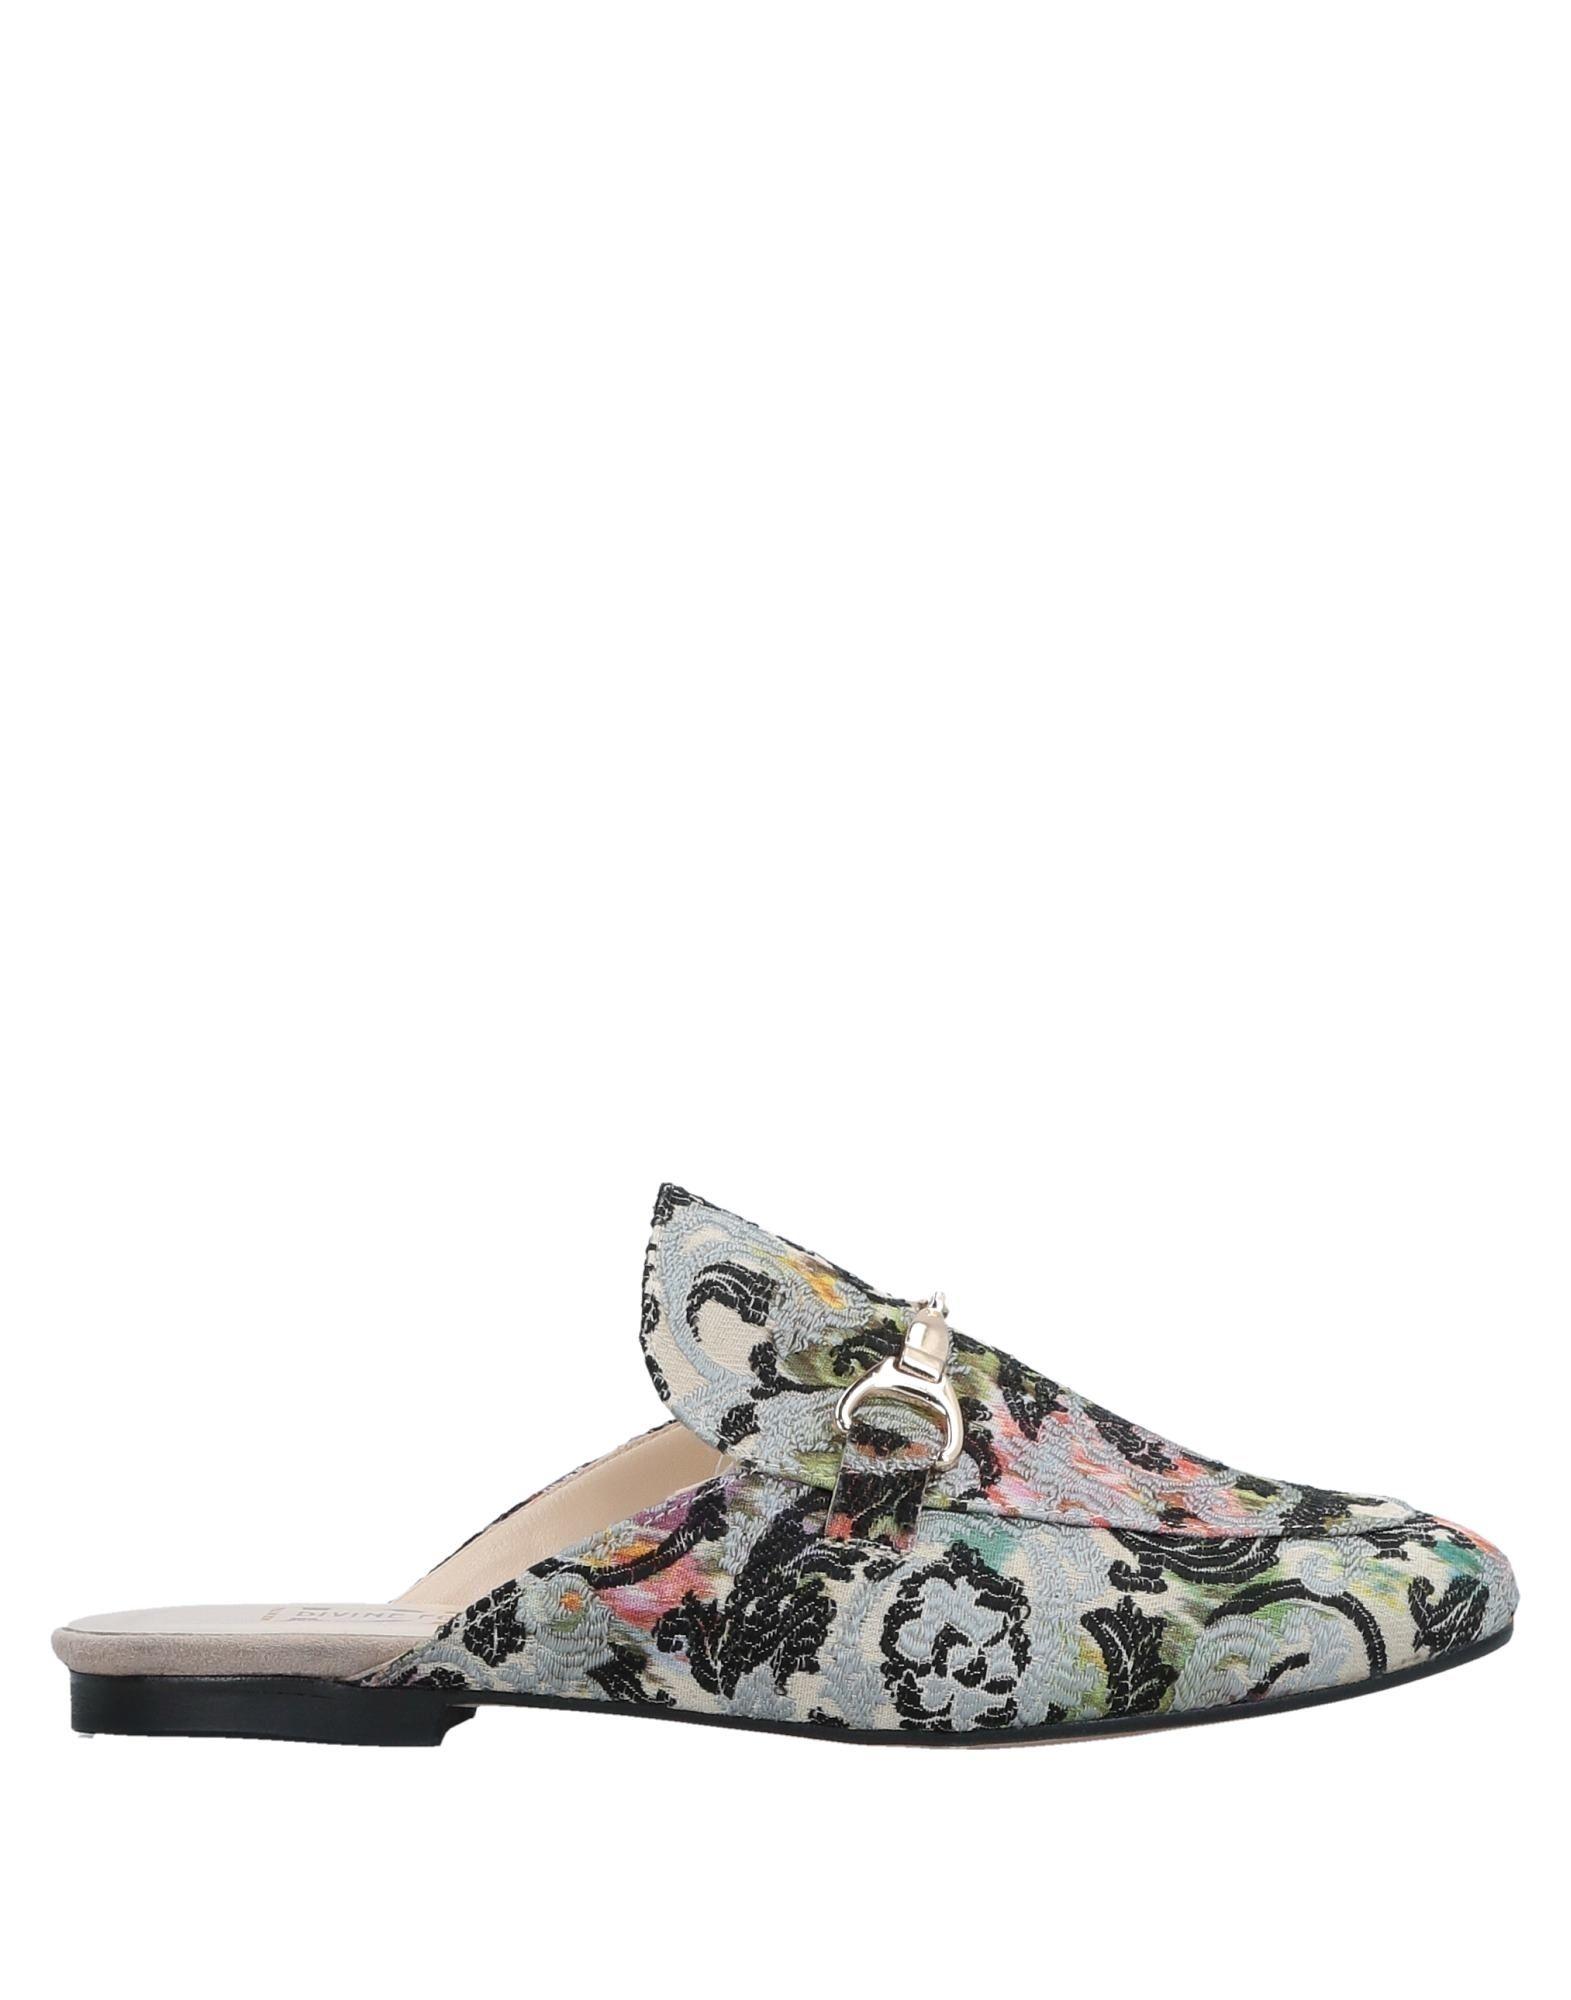 Divine Follie Pantoletten Damen  11515957FH Gute Qualität beliebte Schuhe